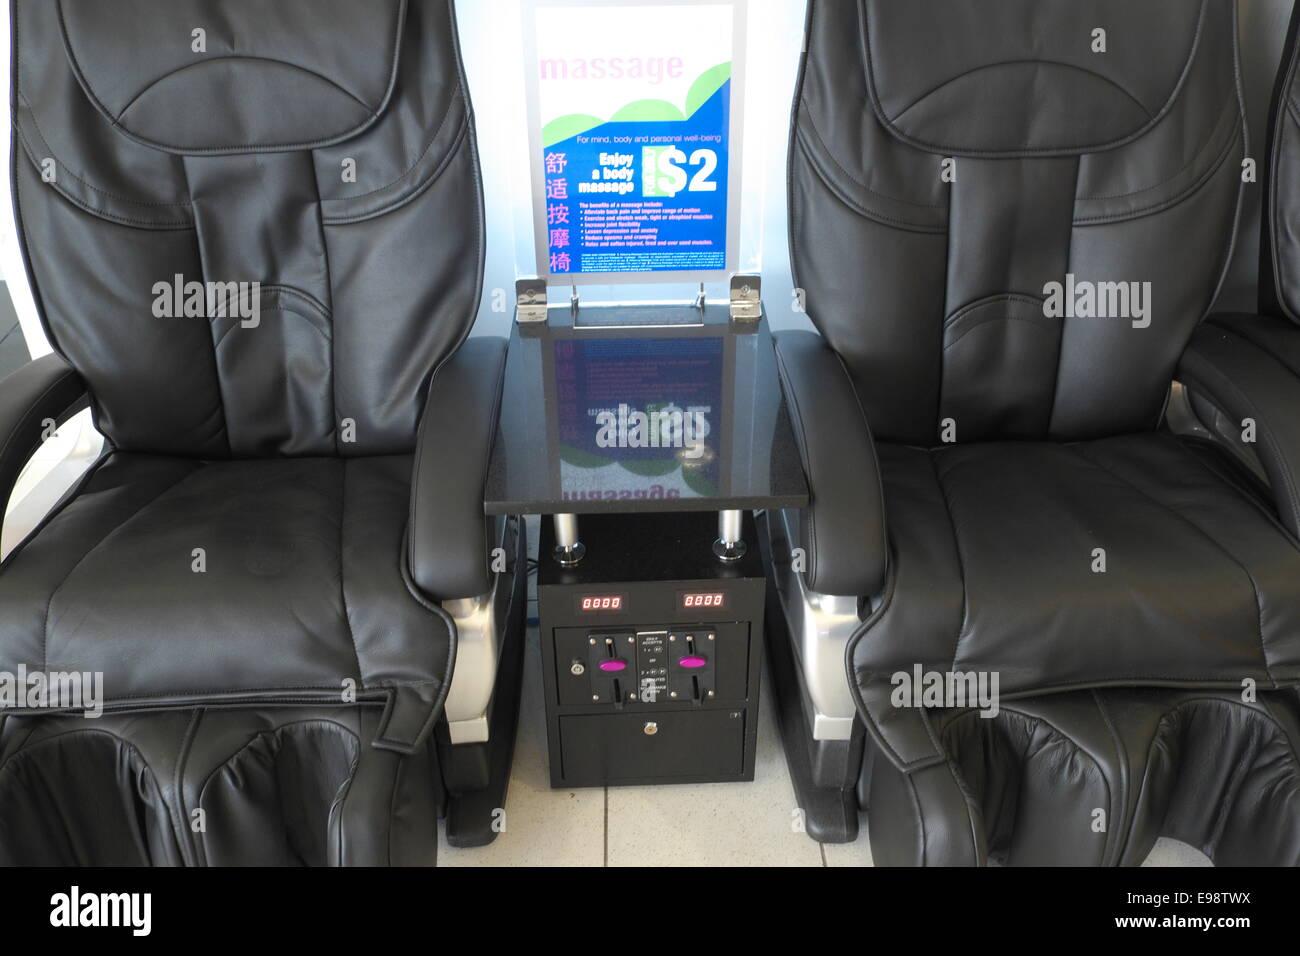 backache massage chairs at sydney airport,australia Stock Photo